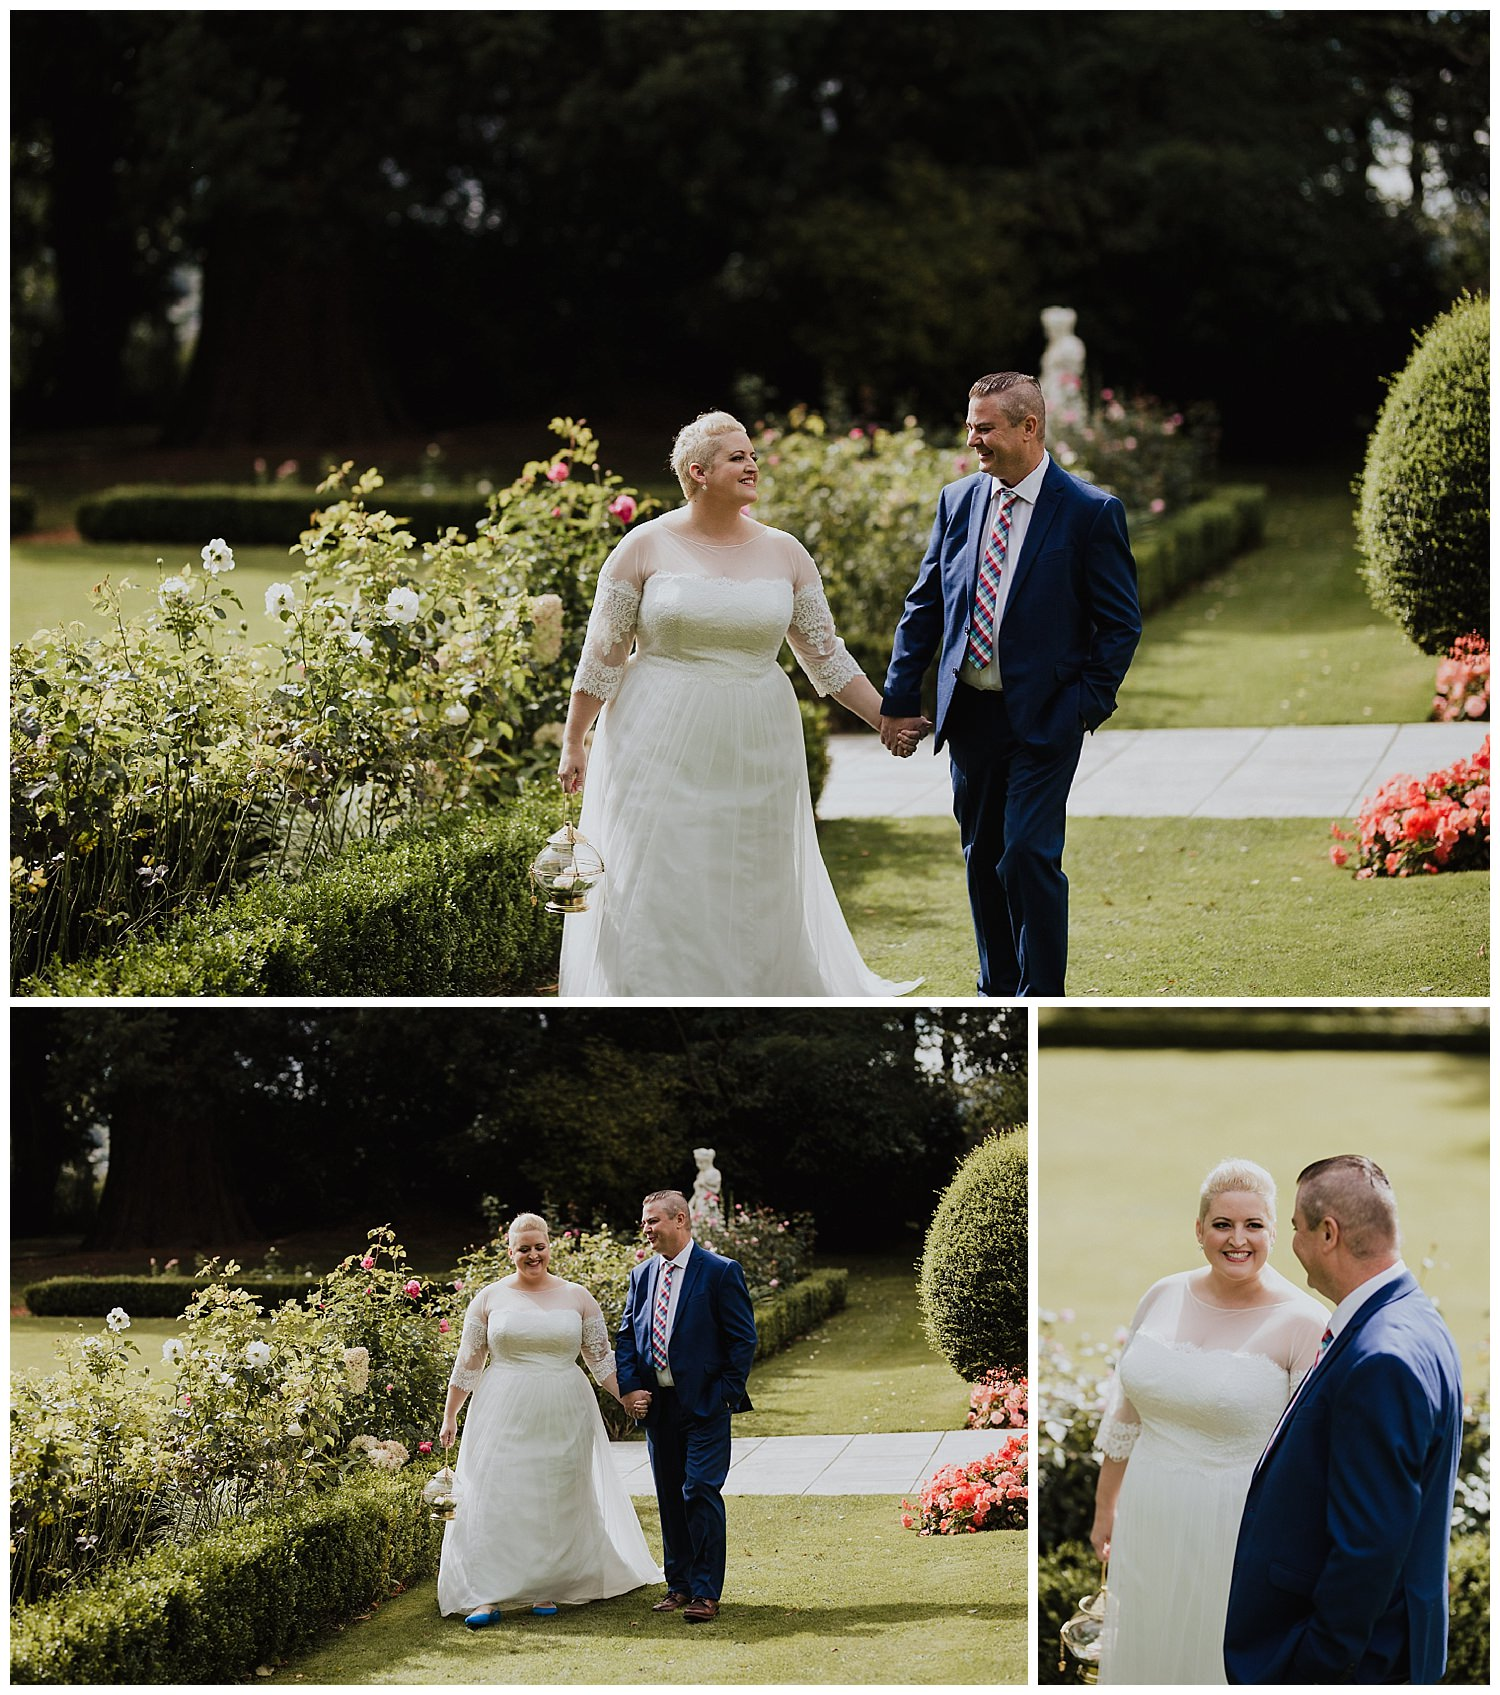 alternative_wedding_tinakilly_house_liviafigueiredo_175.jpg